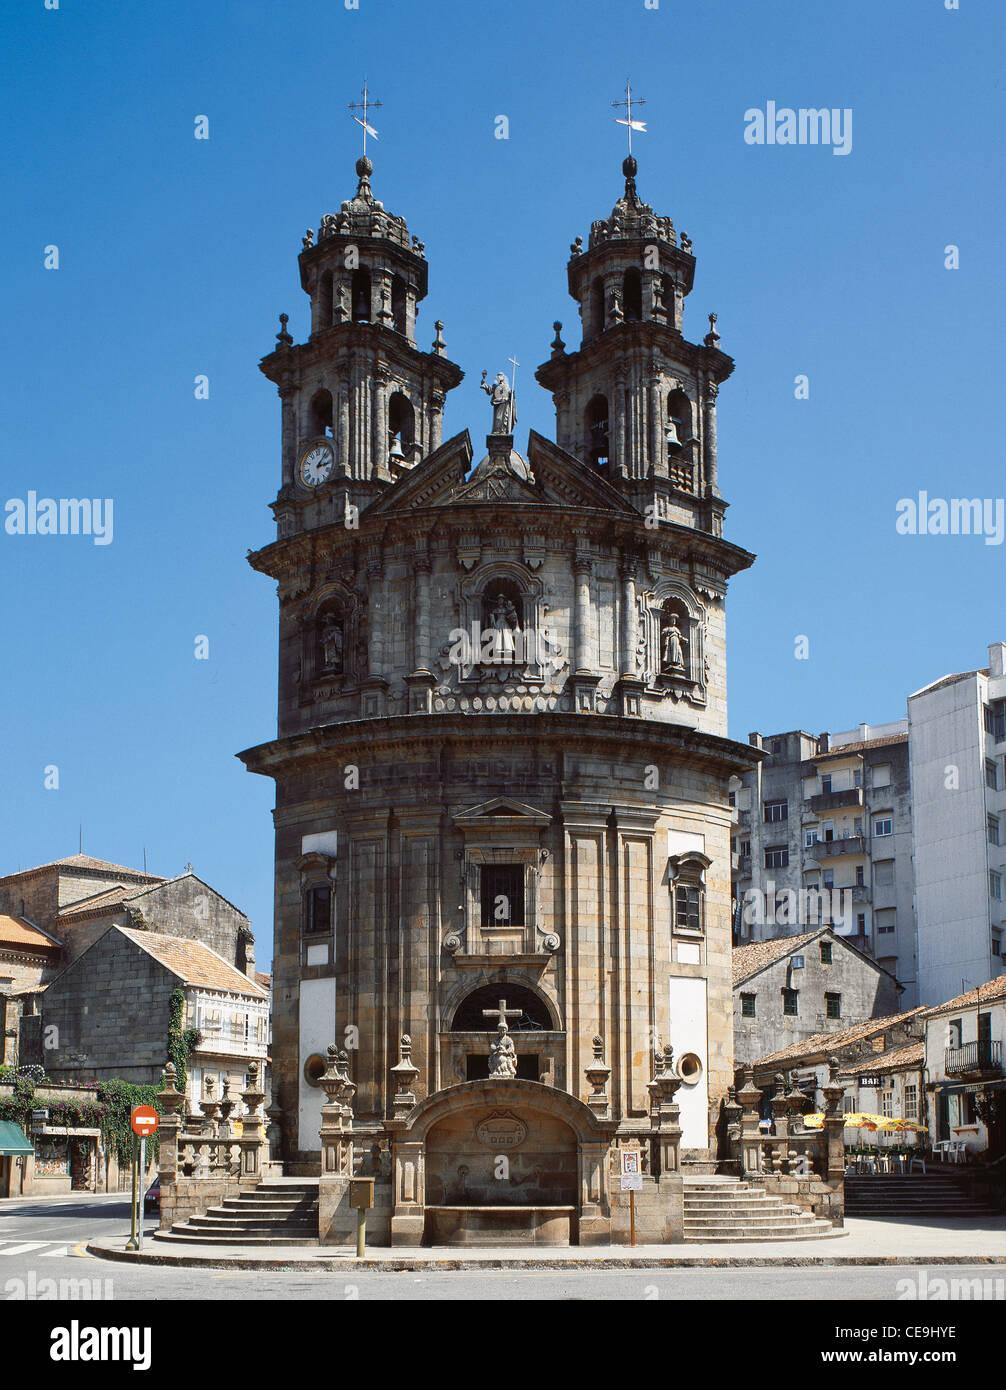 Spain. Pontevedra. Chapel of the Pilgrims. 1778. Built by Antonio Scouto. Exterior. - Stock Image